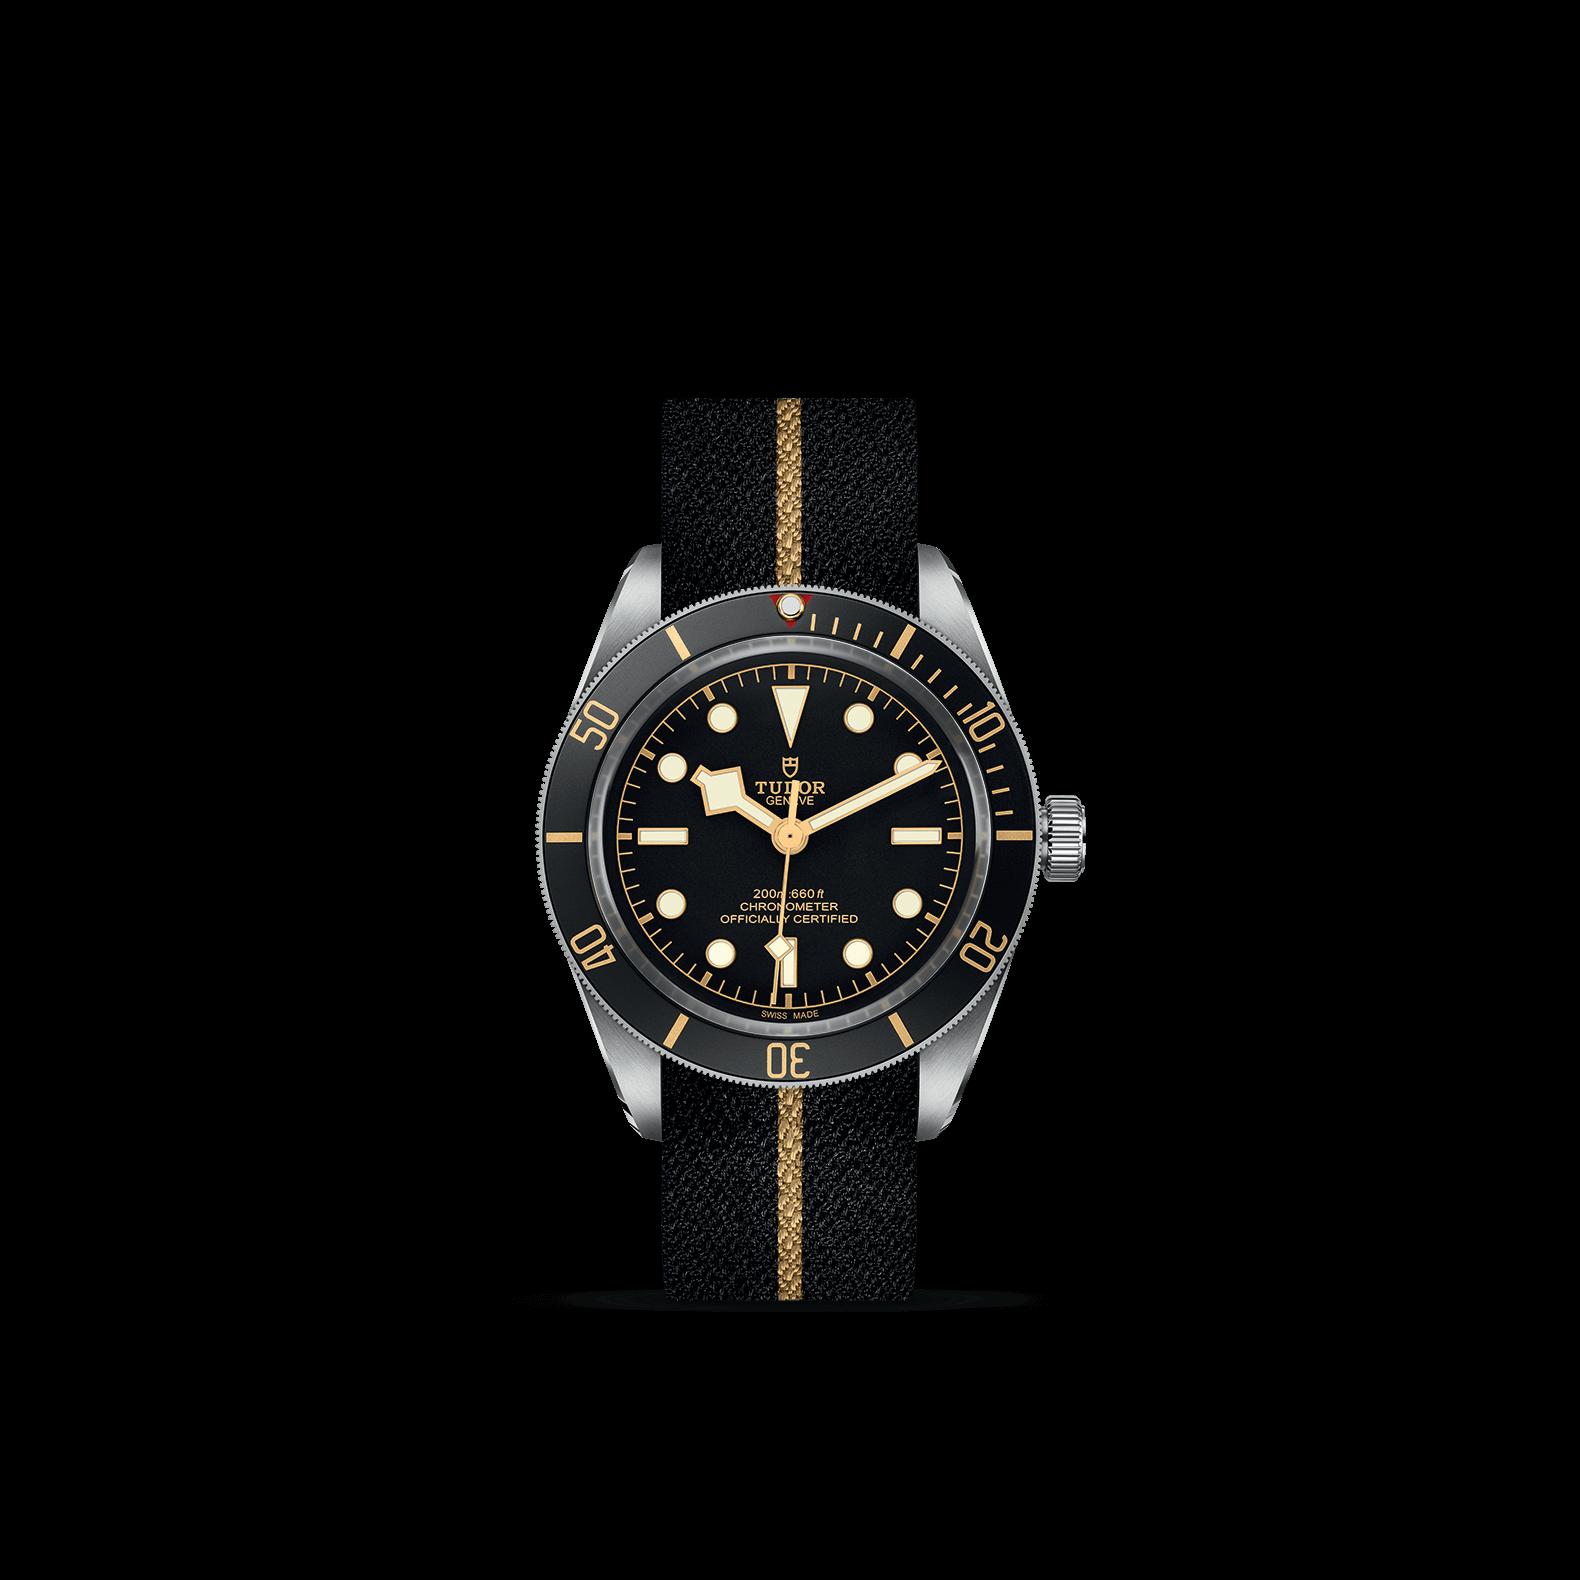 Orologio  TUDOR Black Bay Fifty-Eight presso A. Dupanloup - Orologeria e gioielleria a